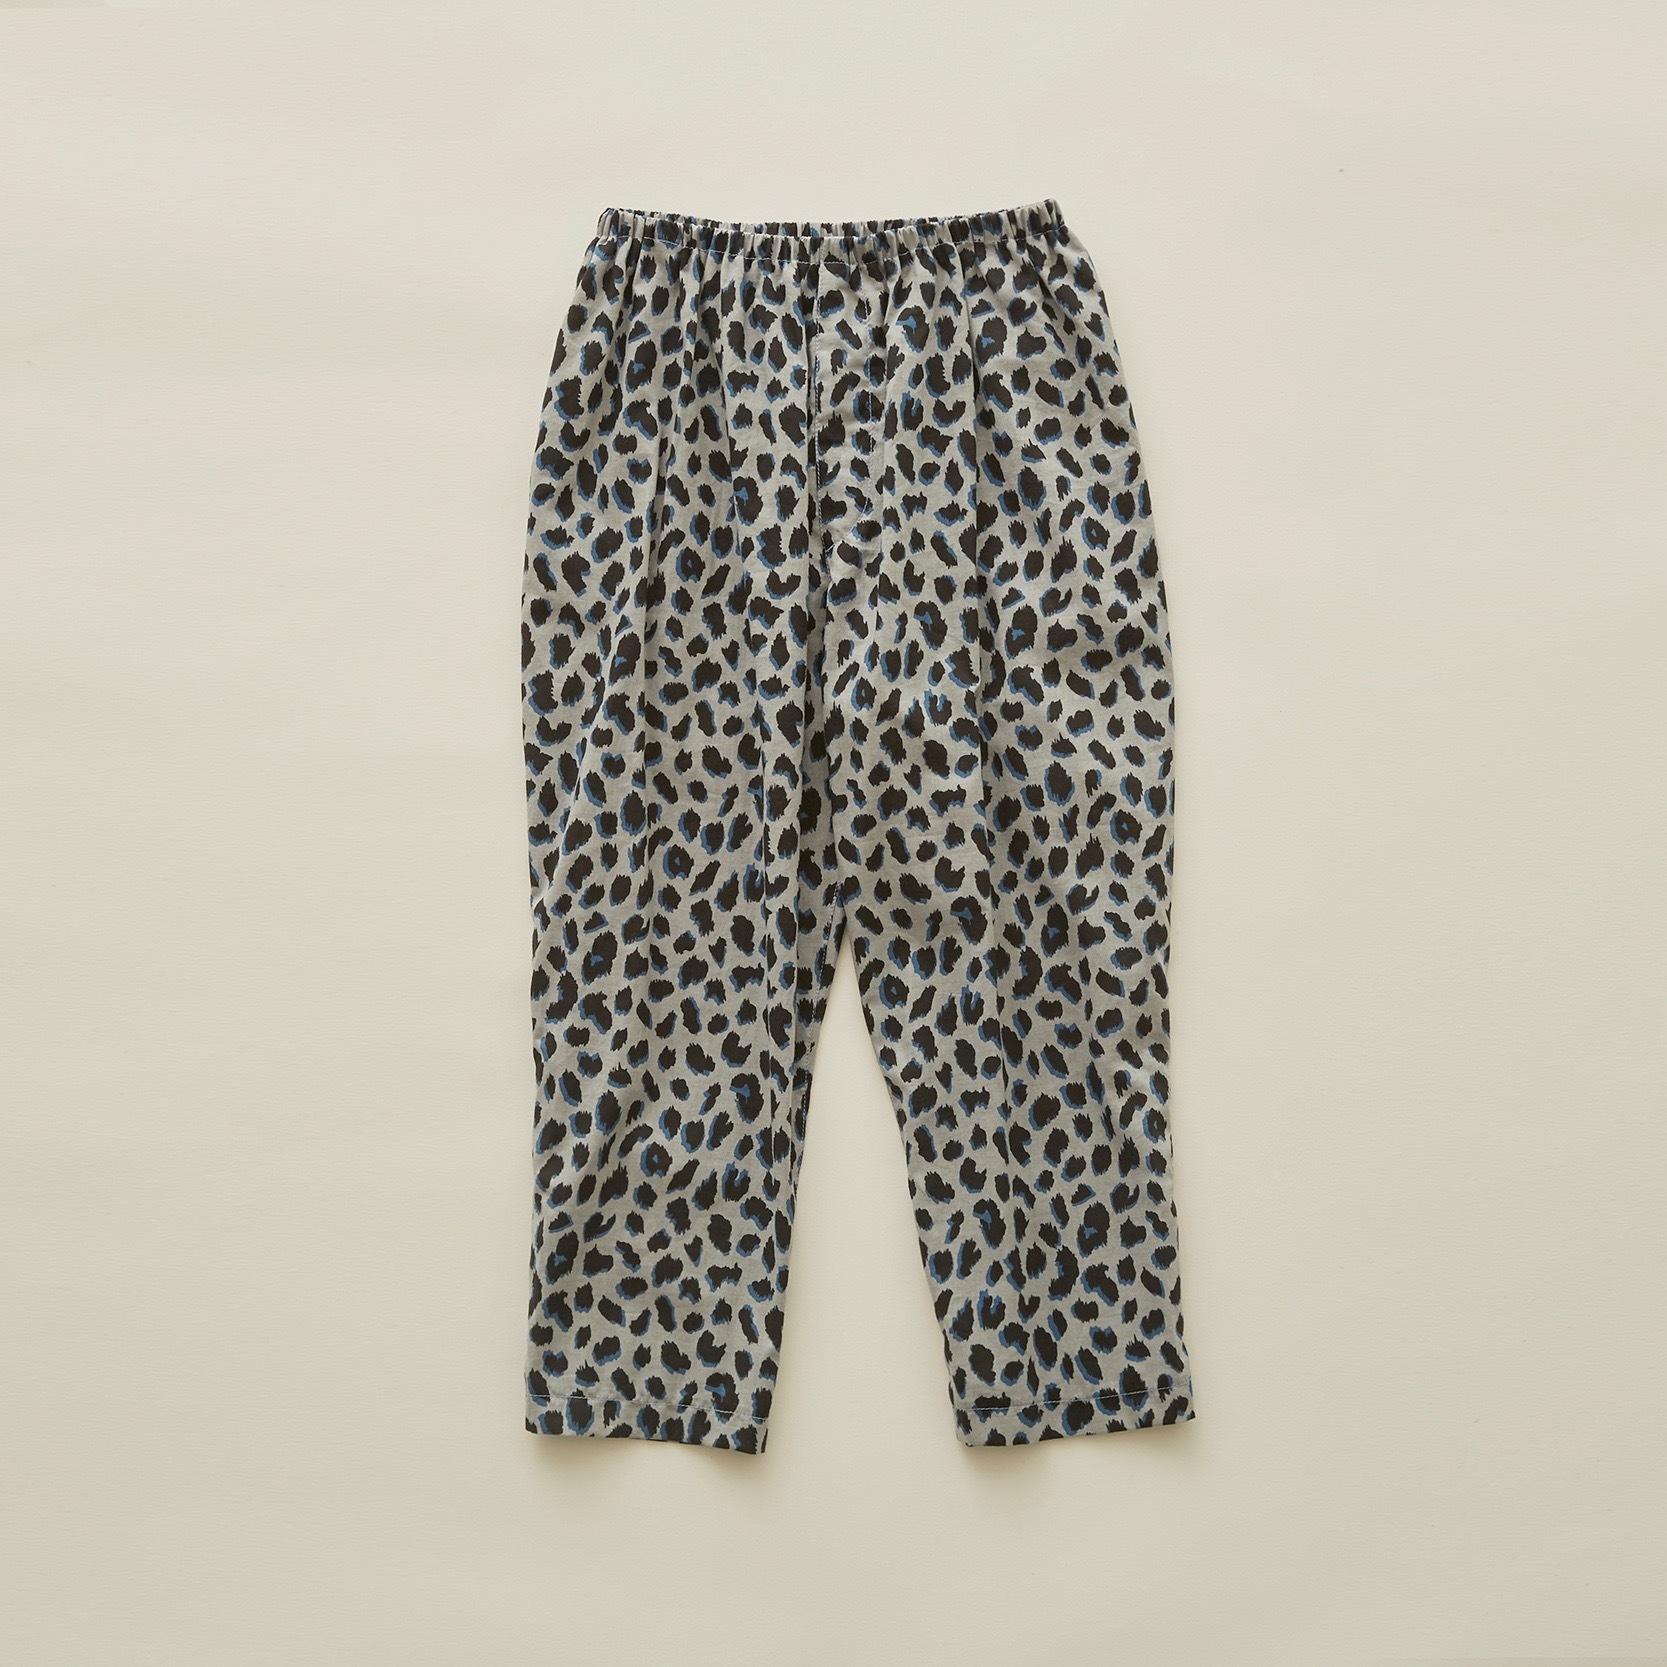 《eLfinFolk 2020SS》leopard pants / gray / 110-130cm